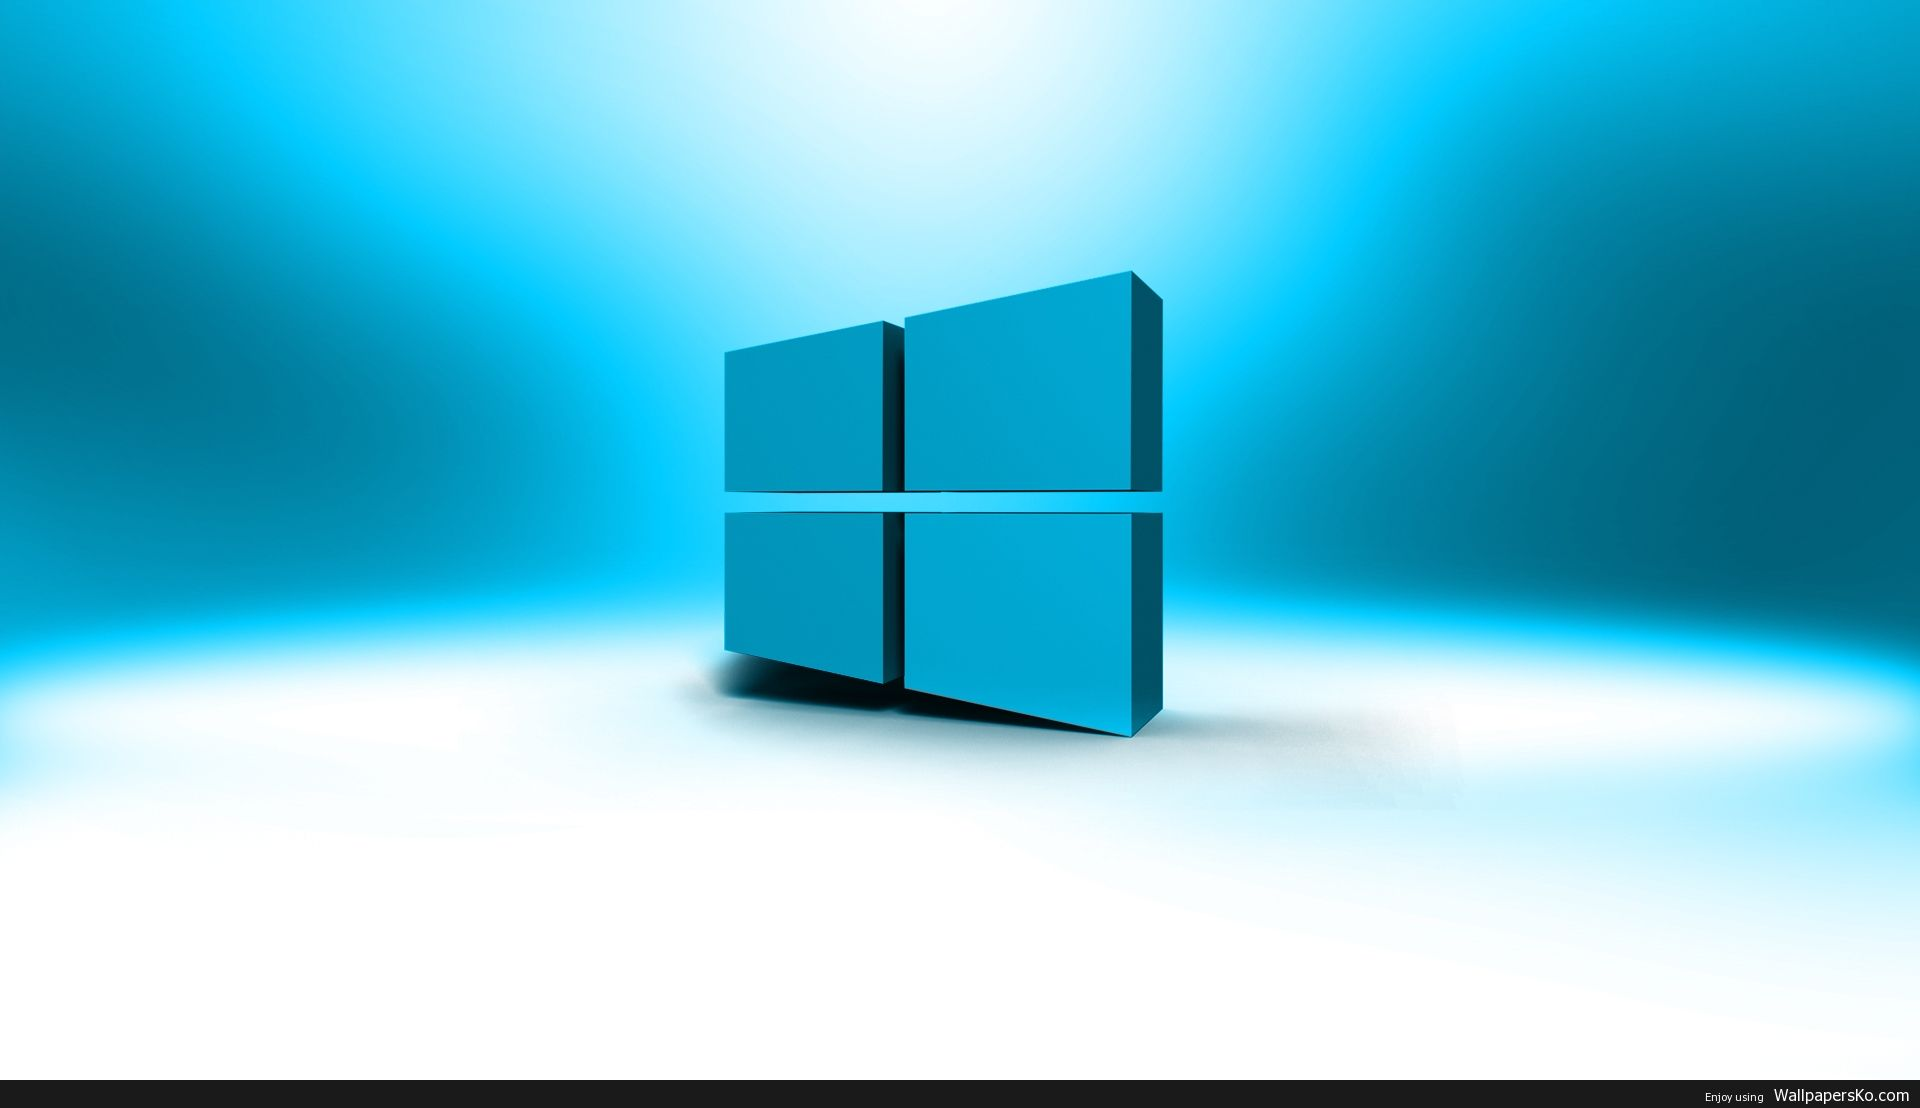 Windows 10 Windows 10 Logo Windows Windows 10 1080p Wallpaper Hdwallpaper Desktop Windows Wallpaper Windows 10 Spring Desktop Wallpaper